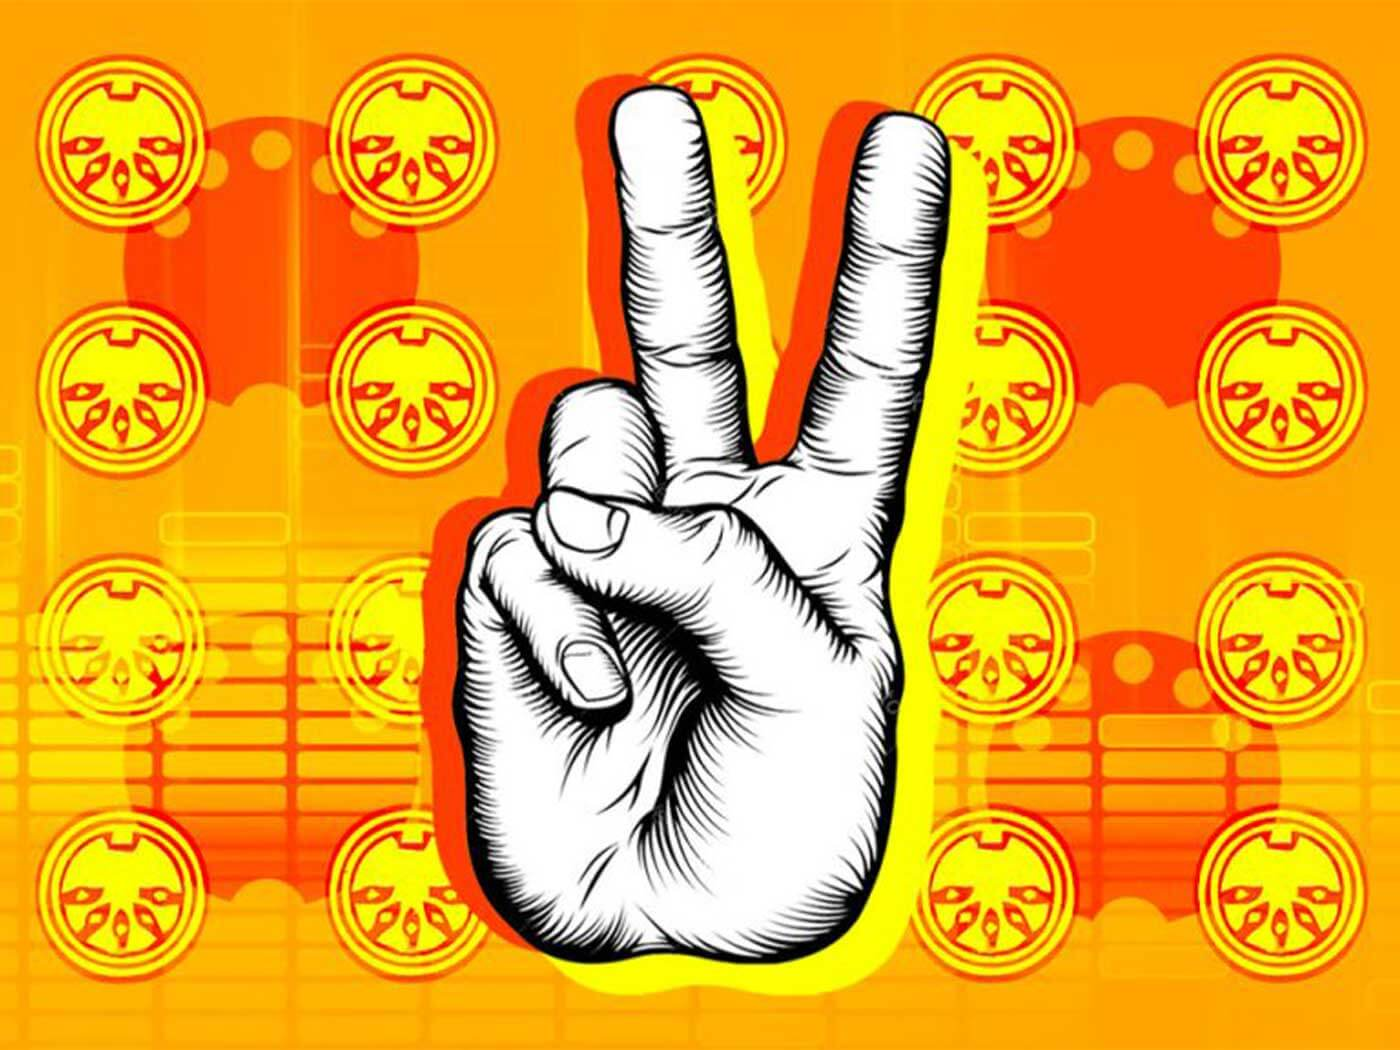 MIDI Association makes MIDI 2.0 specs available for public download - MusicTech